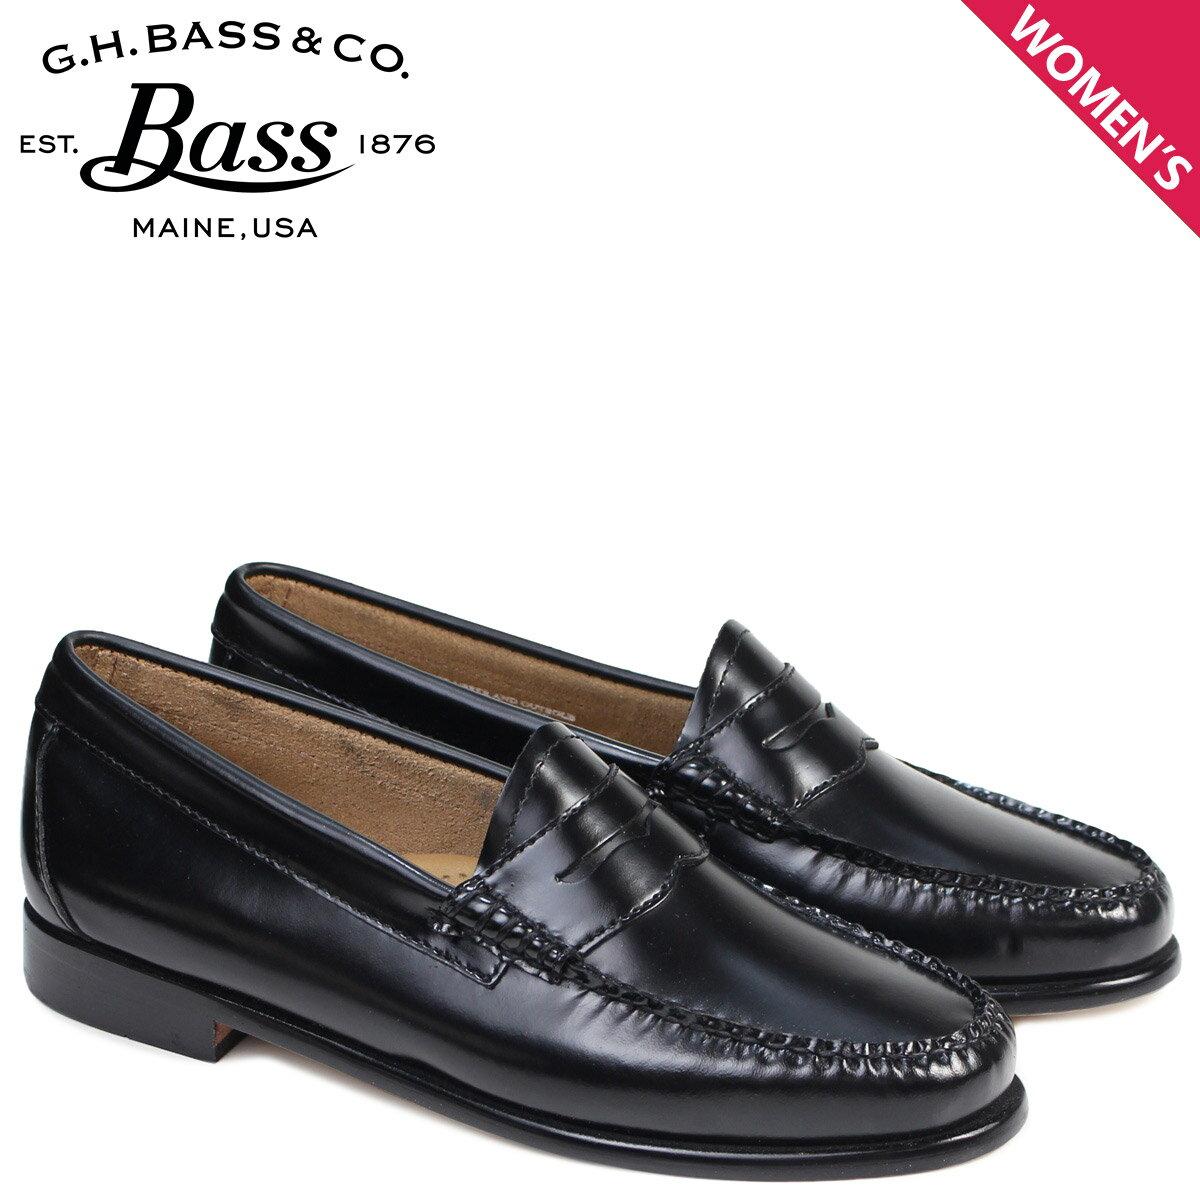 G.H. BASS ローファー ジーエイチバス レディース ペニー WHITNEY WEEJUNS 71-10334 靴 ブラック [3/1 追加入荷]